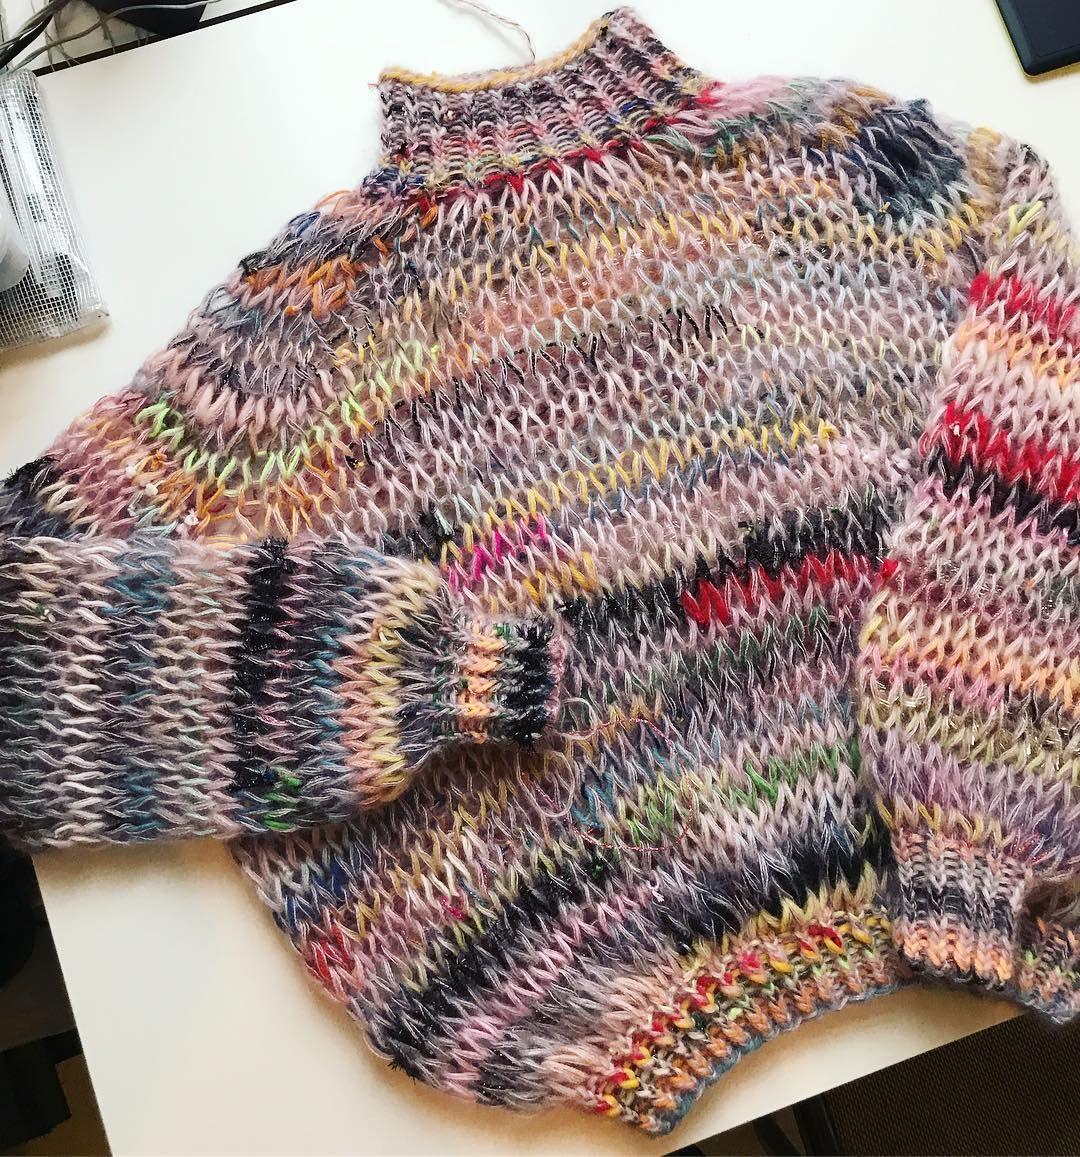 "Photo of Lærke Bagger on Instagram: ""It's almost see through 👀 #laerkebagger #knitwear #scrapknitting"""